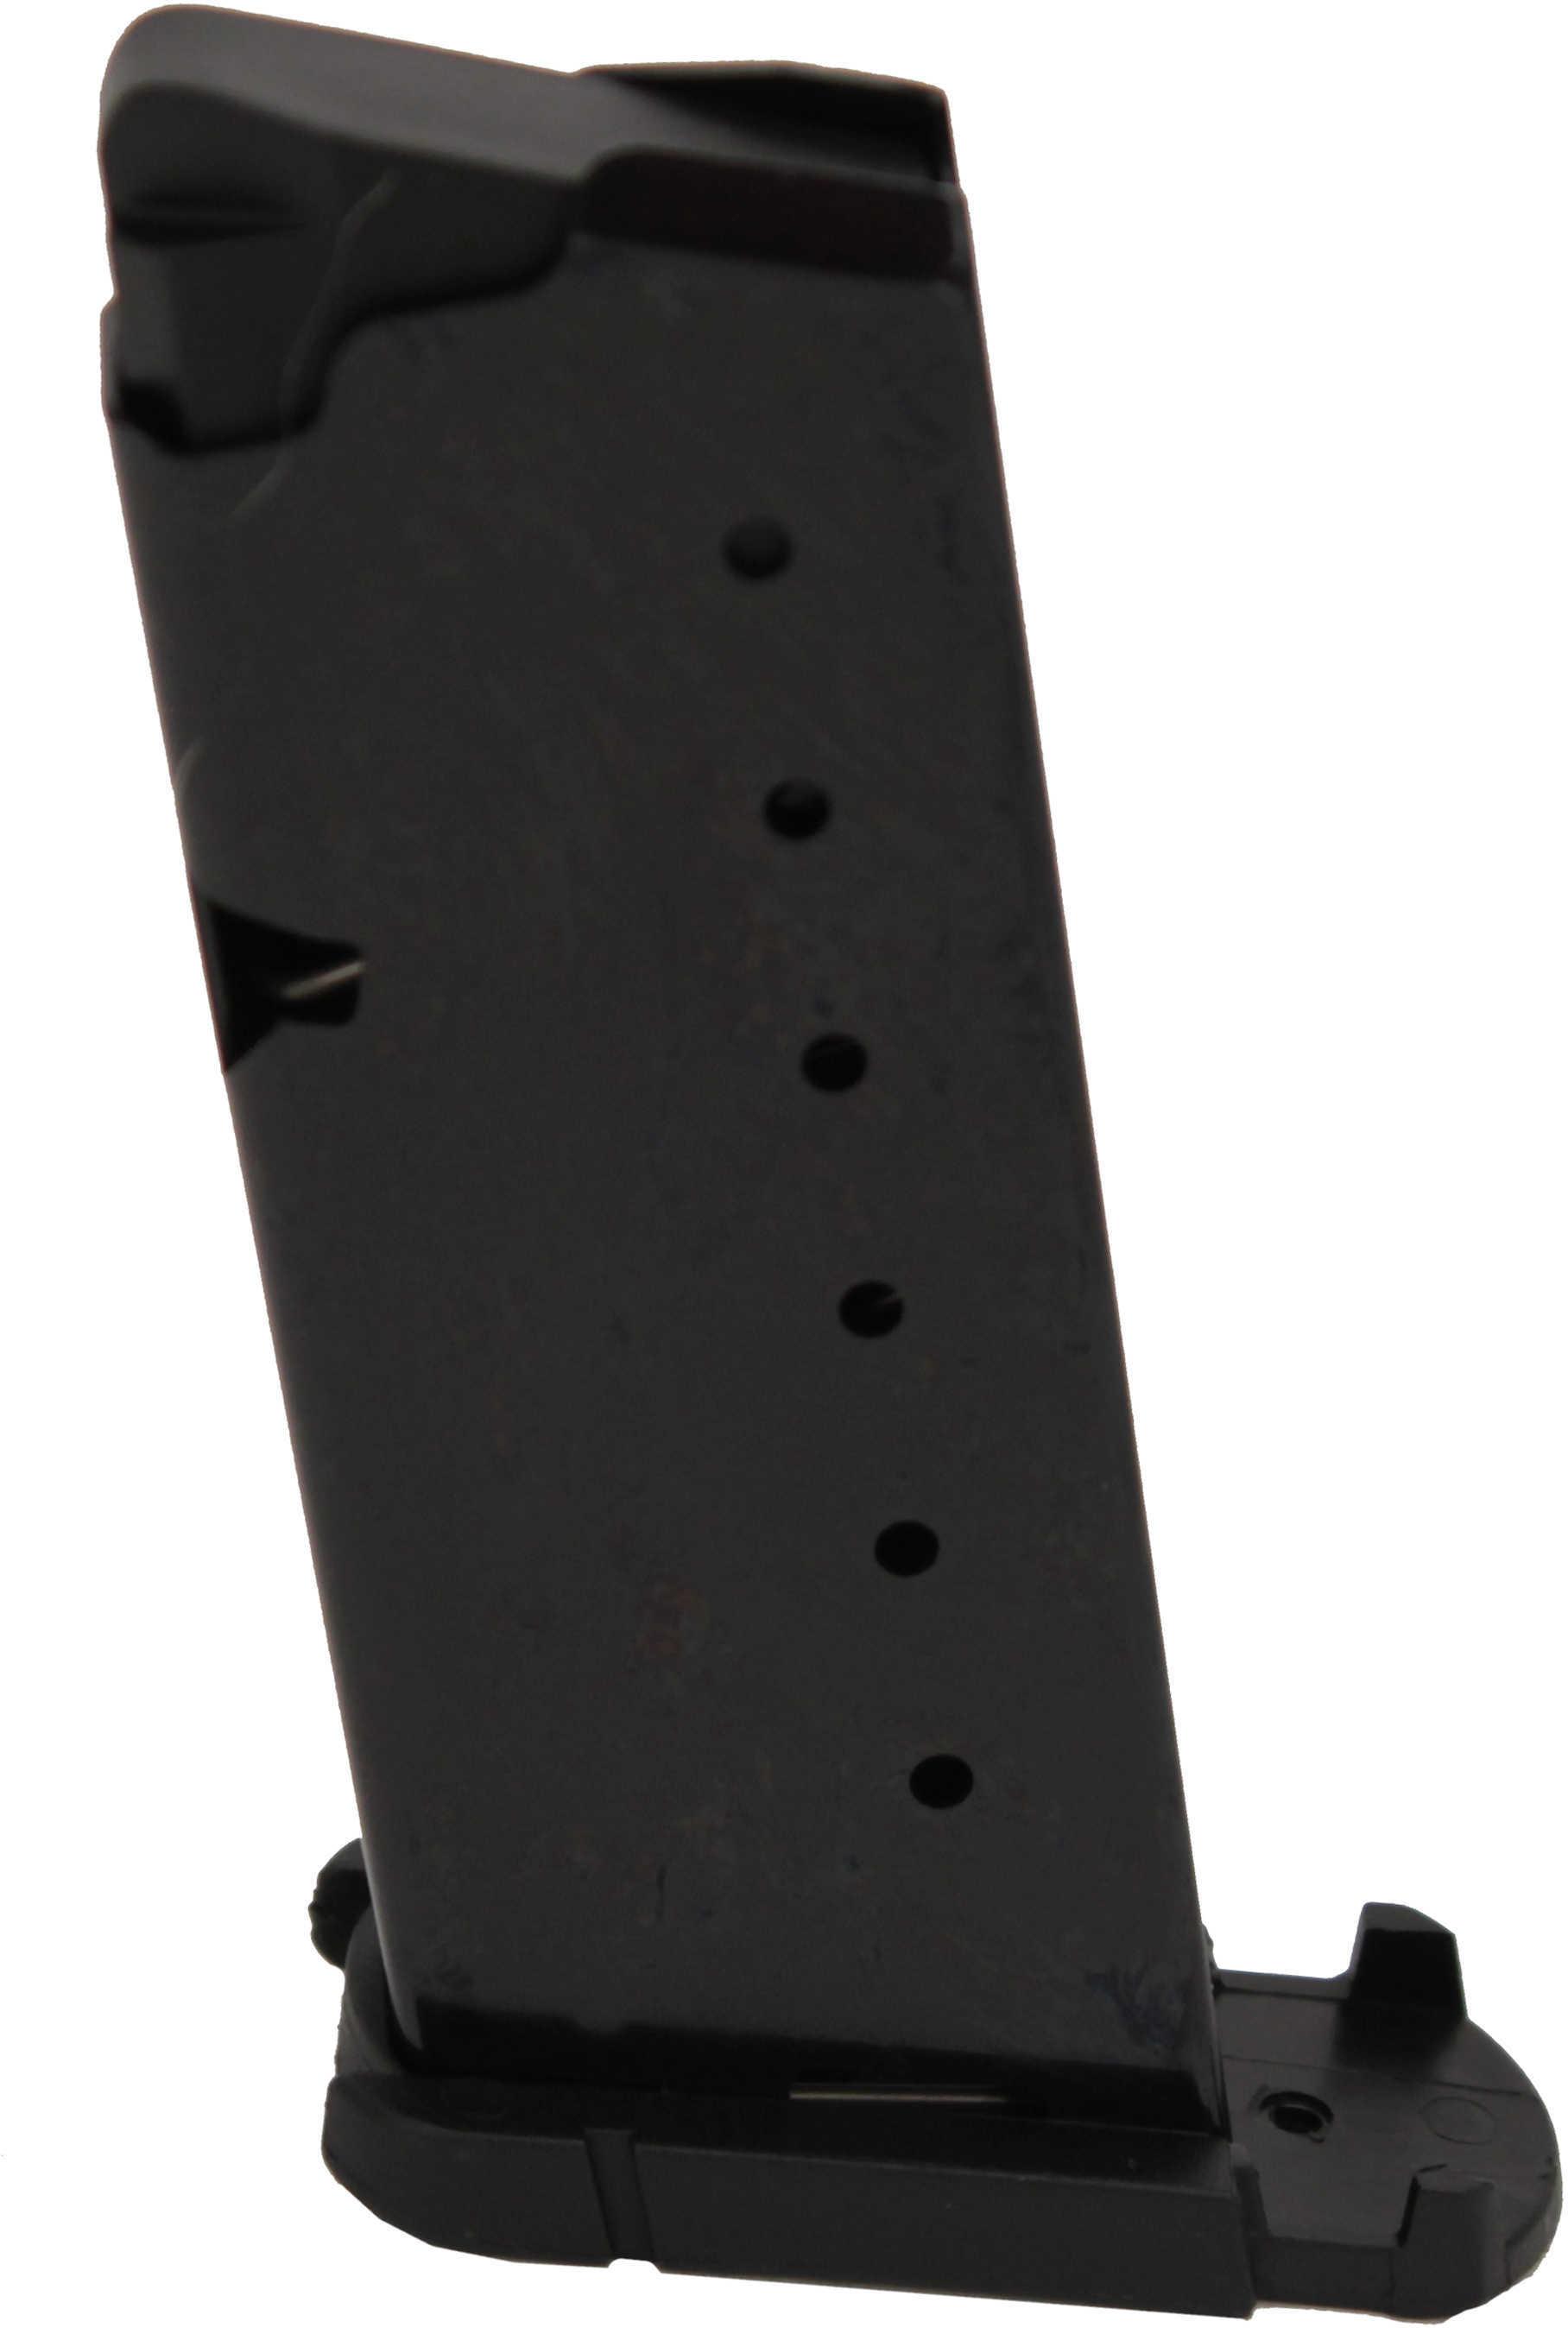 Walther Pps .40 S&W Magazine 5 Round Md: 2796554